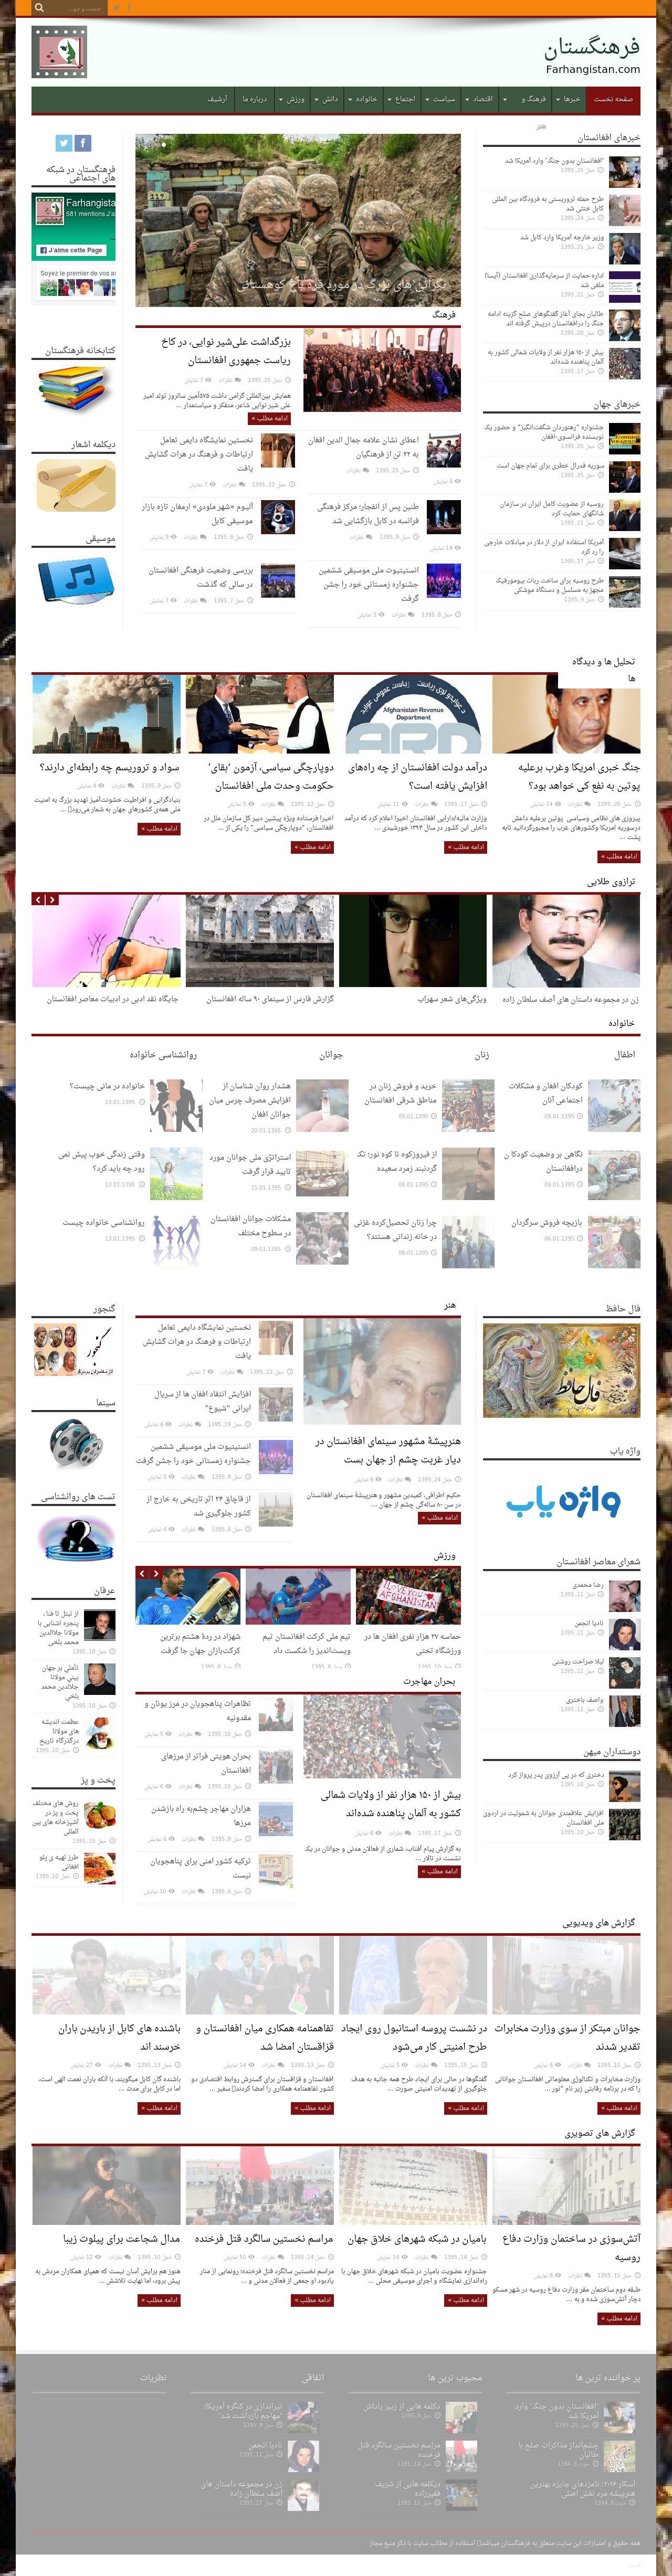 https://danilin.biz/wp-content/uploads/2016/04/farhangistan-site.jpg